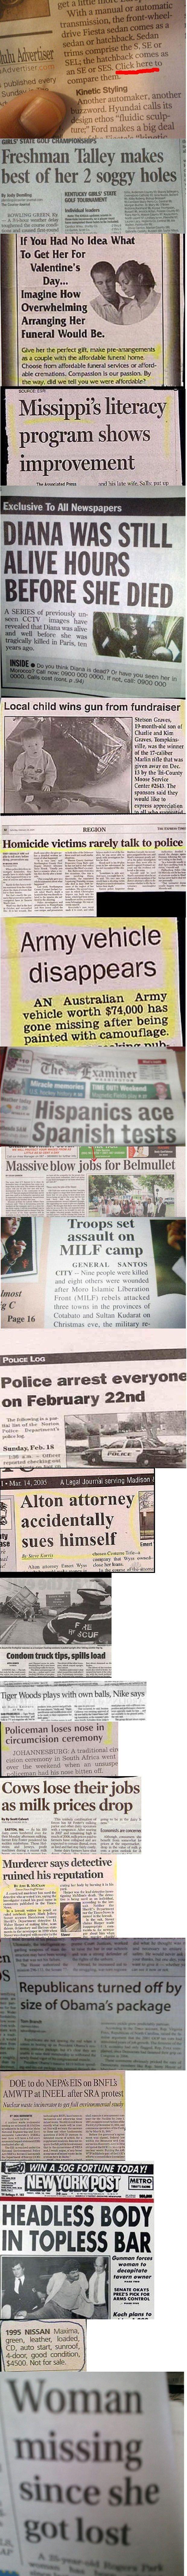 25 Funny Newspaper Headlines